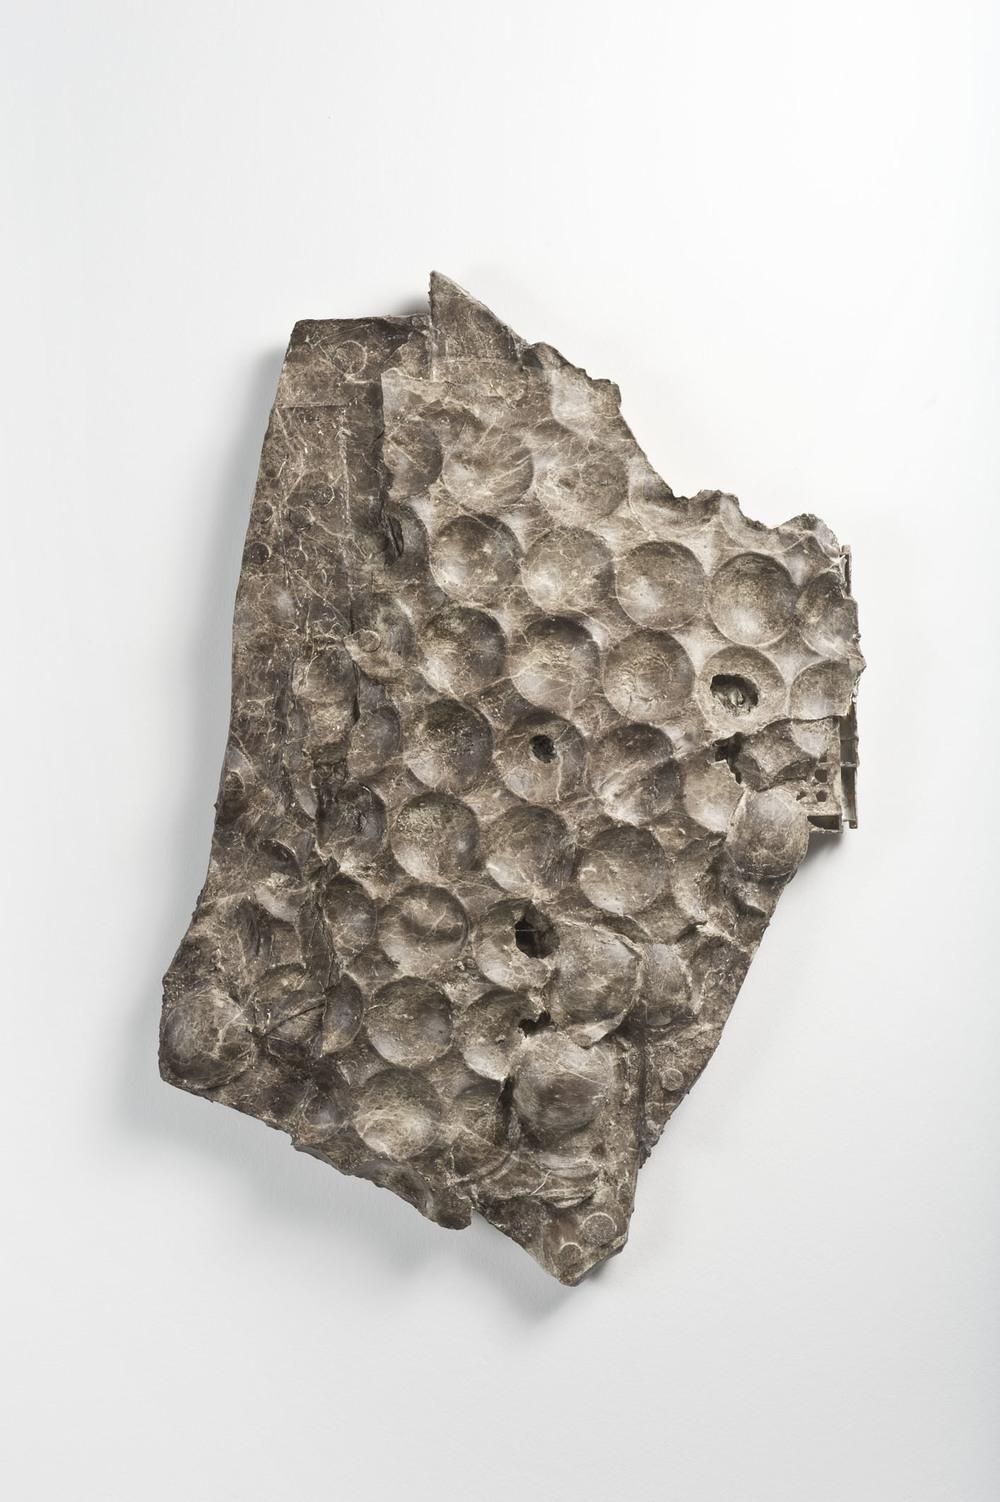 Luca Trevisani, Marmomarmalade, 2013. Dip print su gesso, materiali vari, 87 x 64 x 12 cm  (Courtesy Galleria Mehdi Chouakri, Berlino)